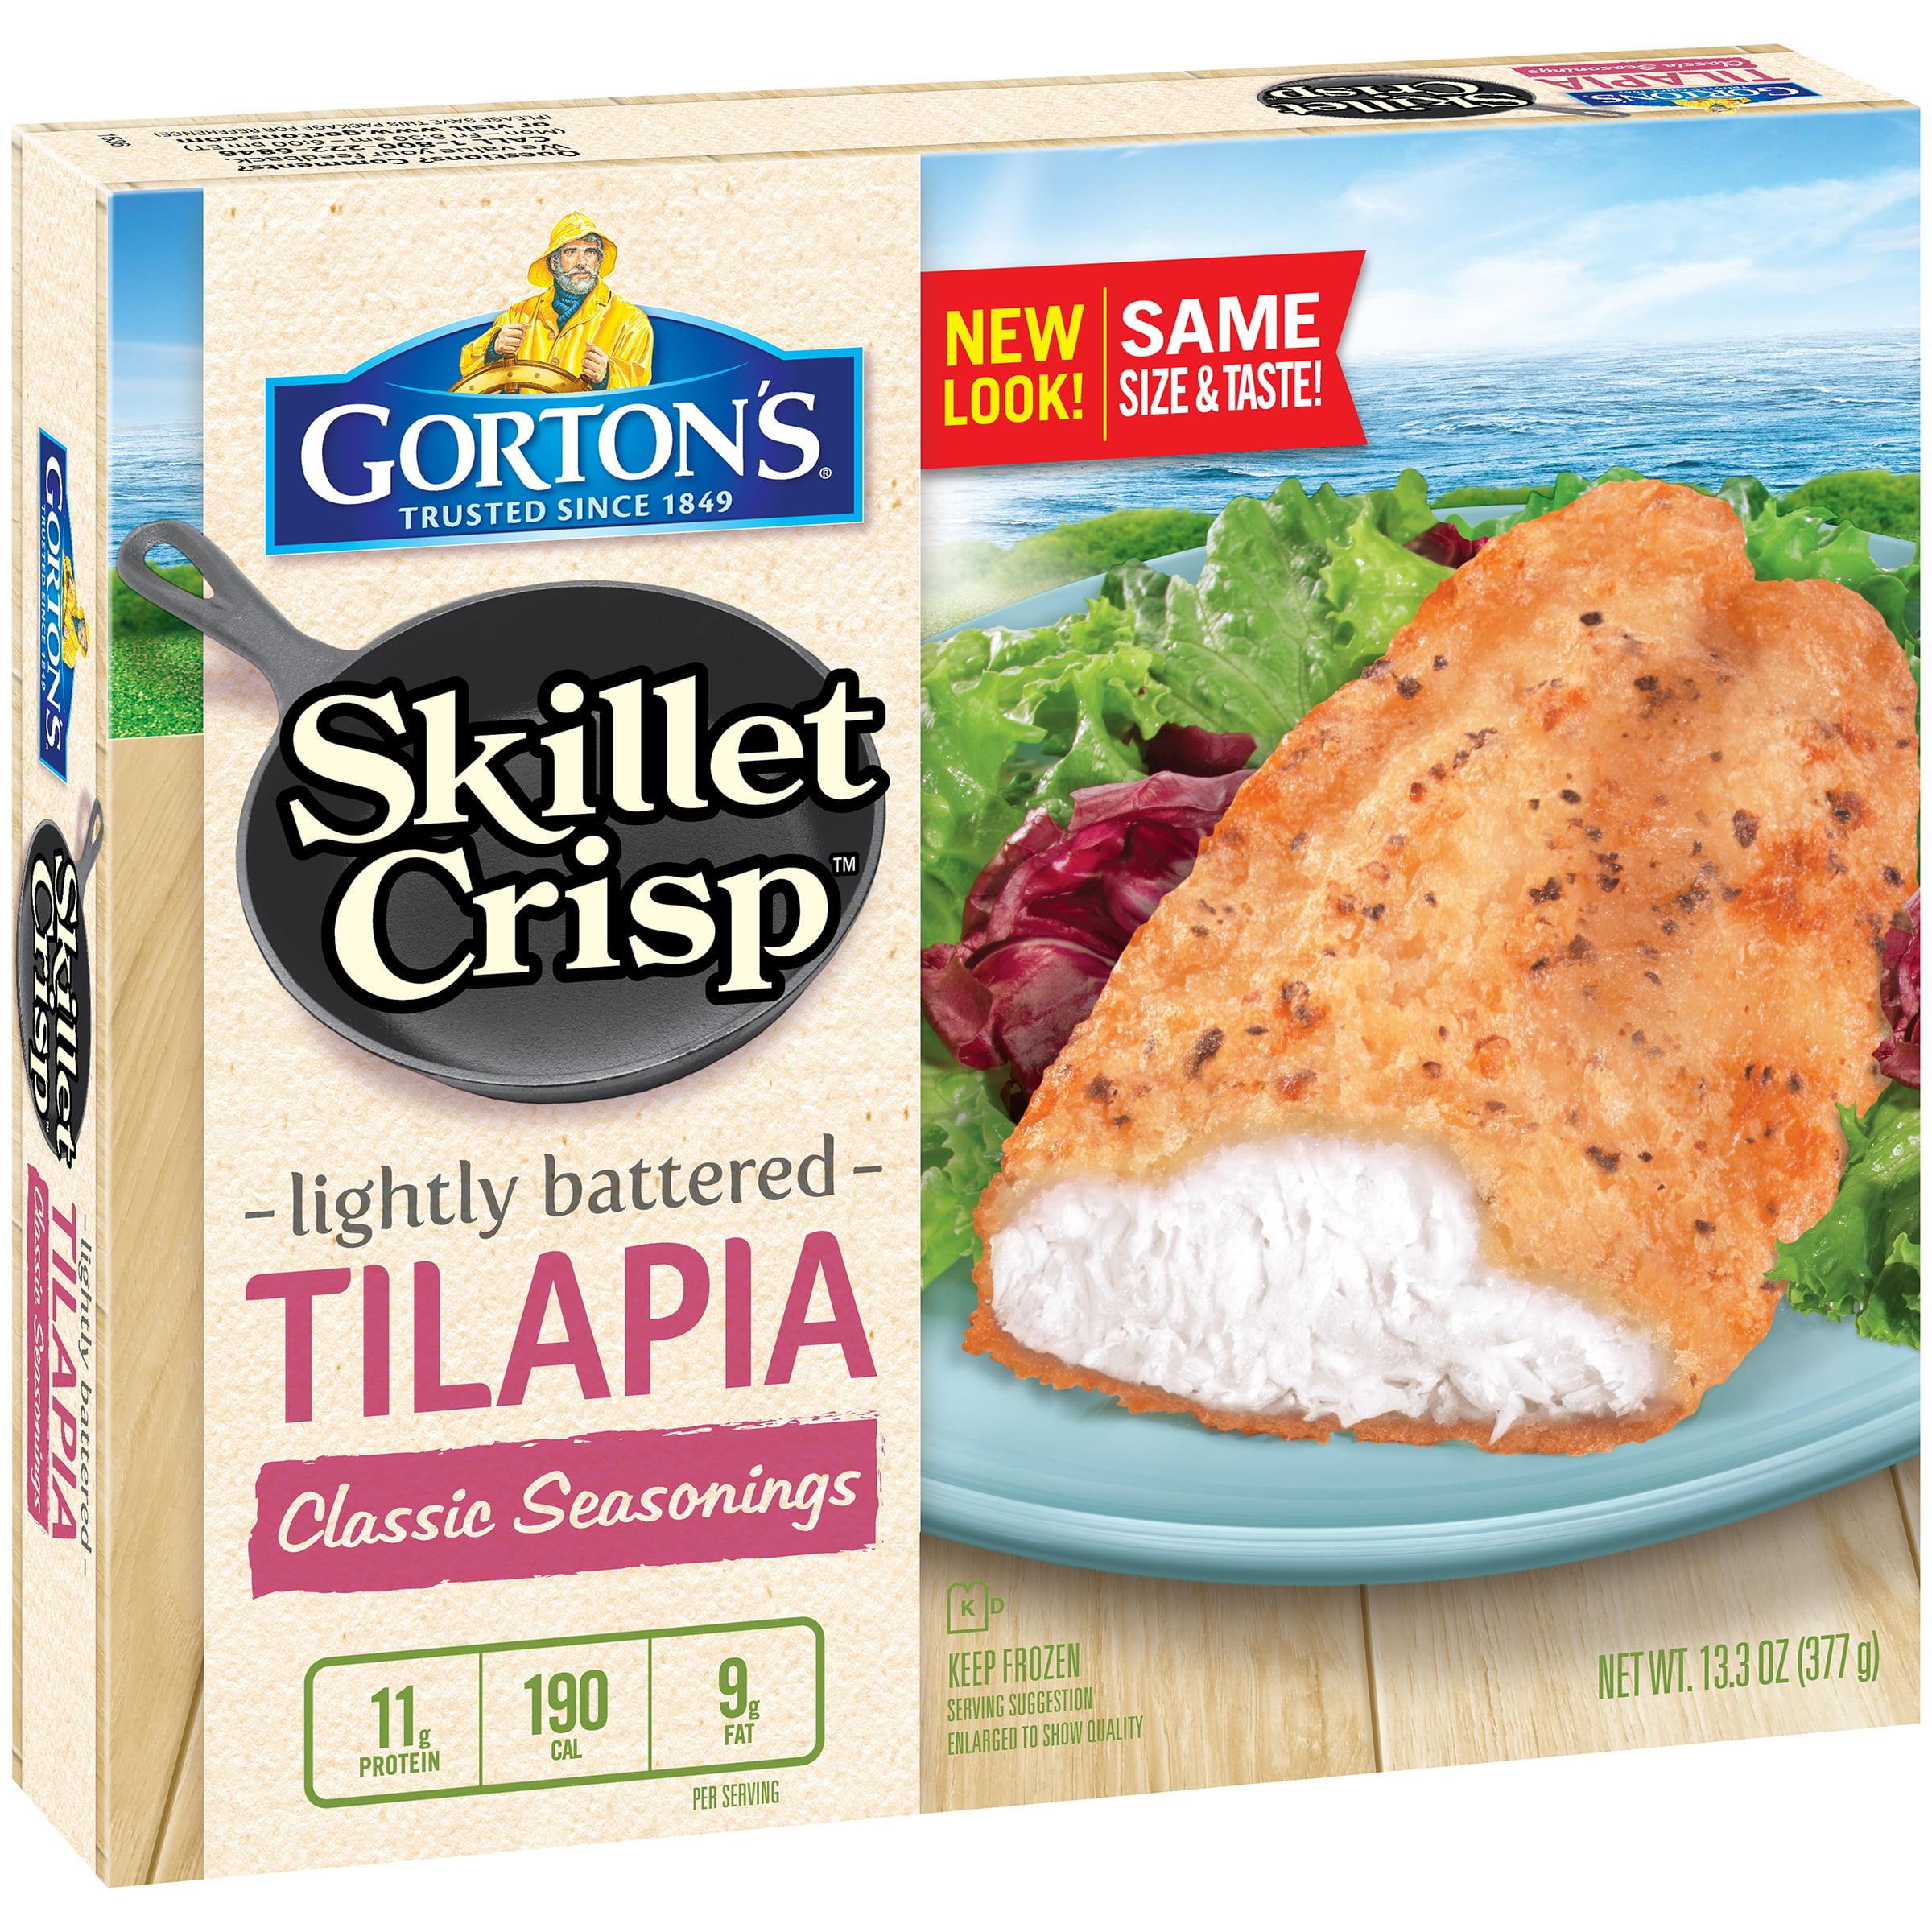 Gorton's�� Skillet Crisp Classic Seasonings Tilapia 13.3 oz. Box